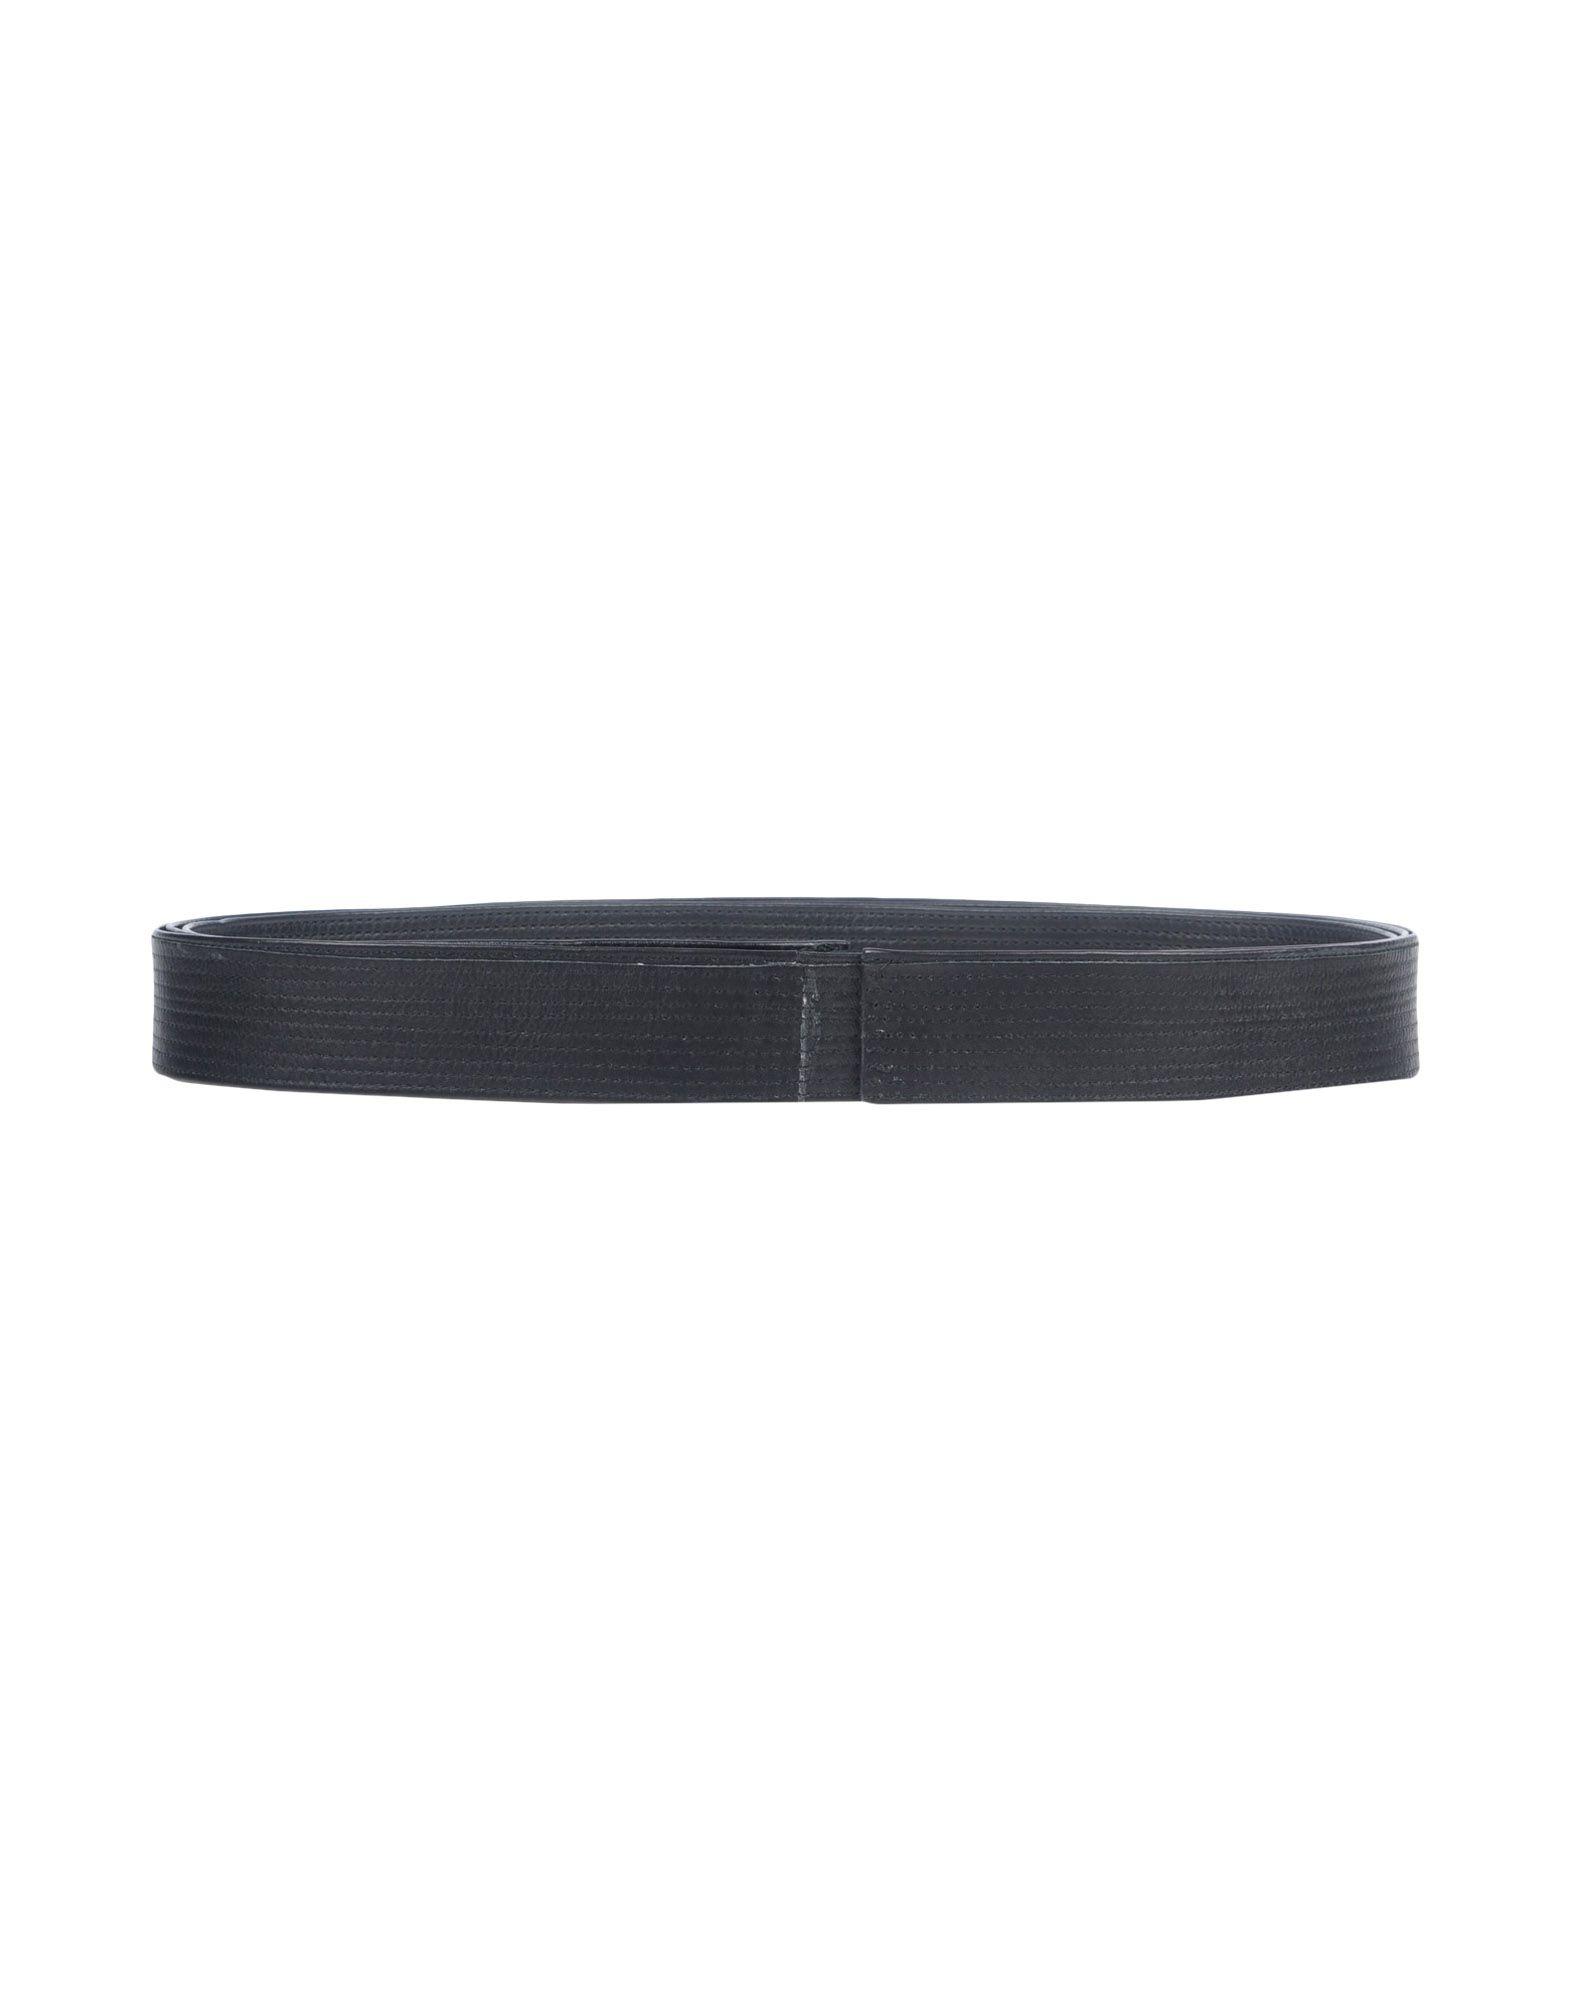 Cintura In Pelle Dsquared2 Uomo - Acquista online su